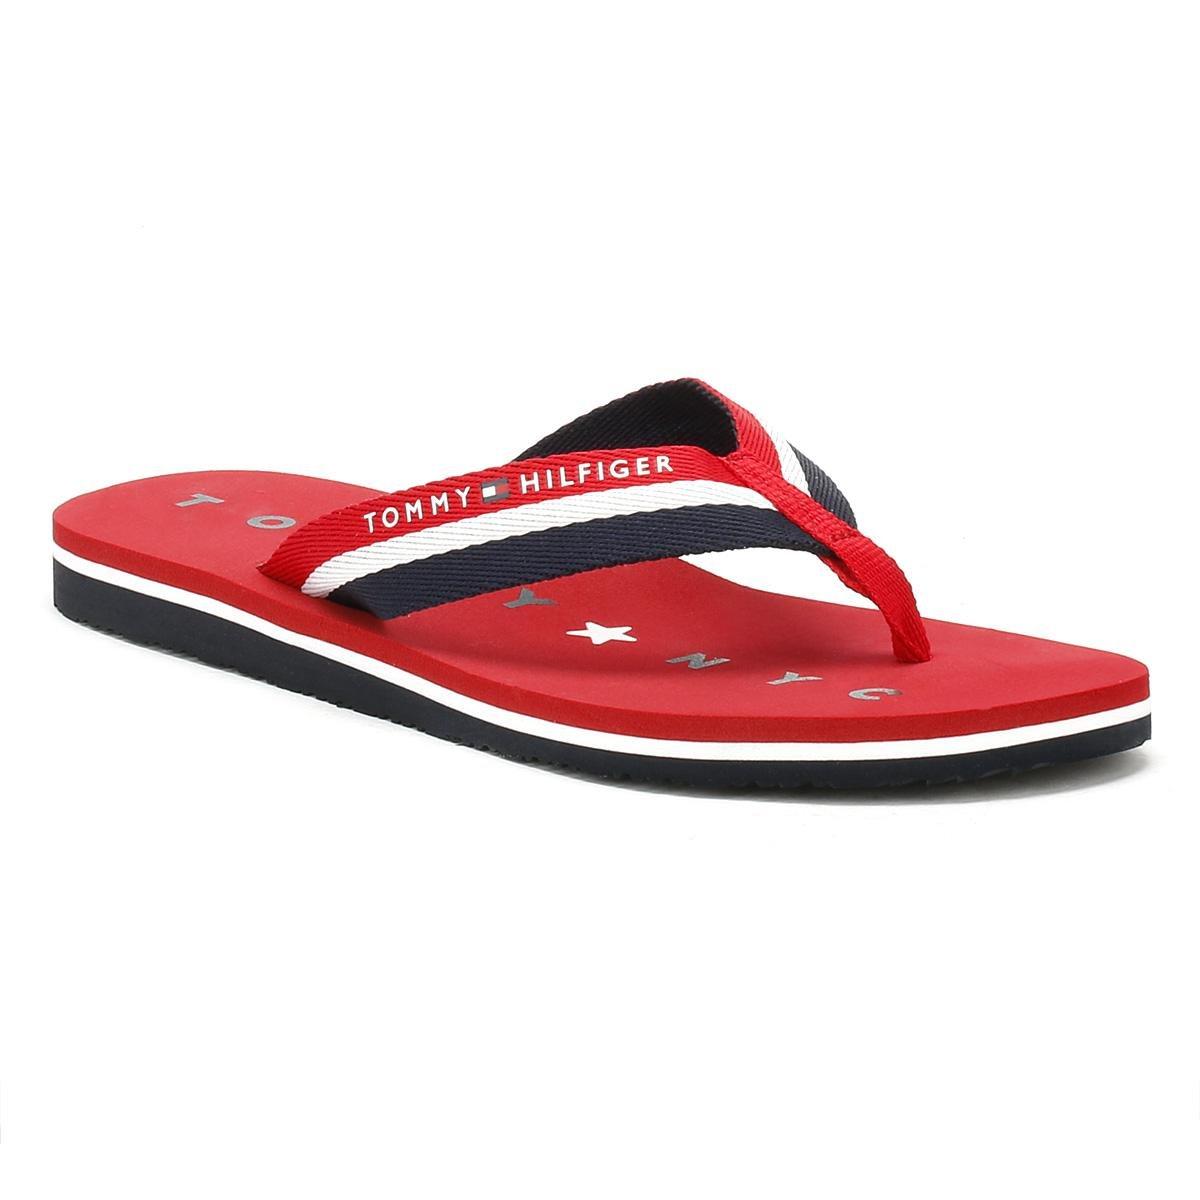 NYC Beach Sandals - Sales Up to -50% Tommy Hilfiger iyrJV8HVpx